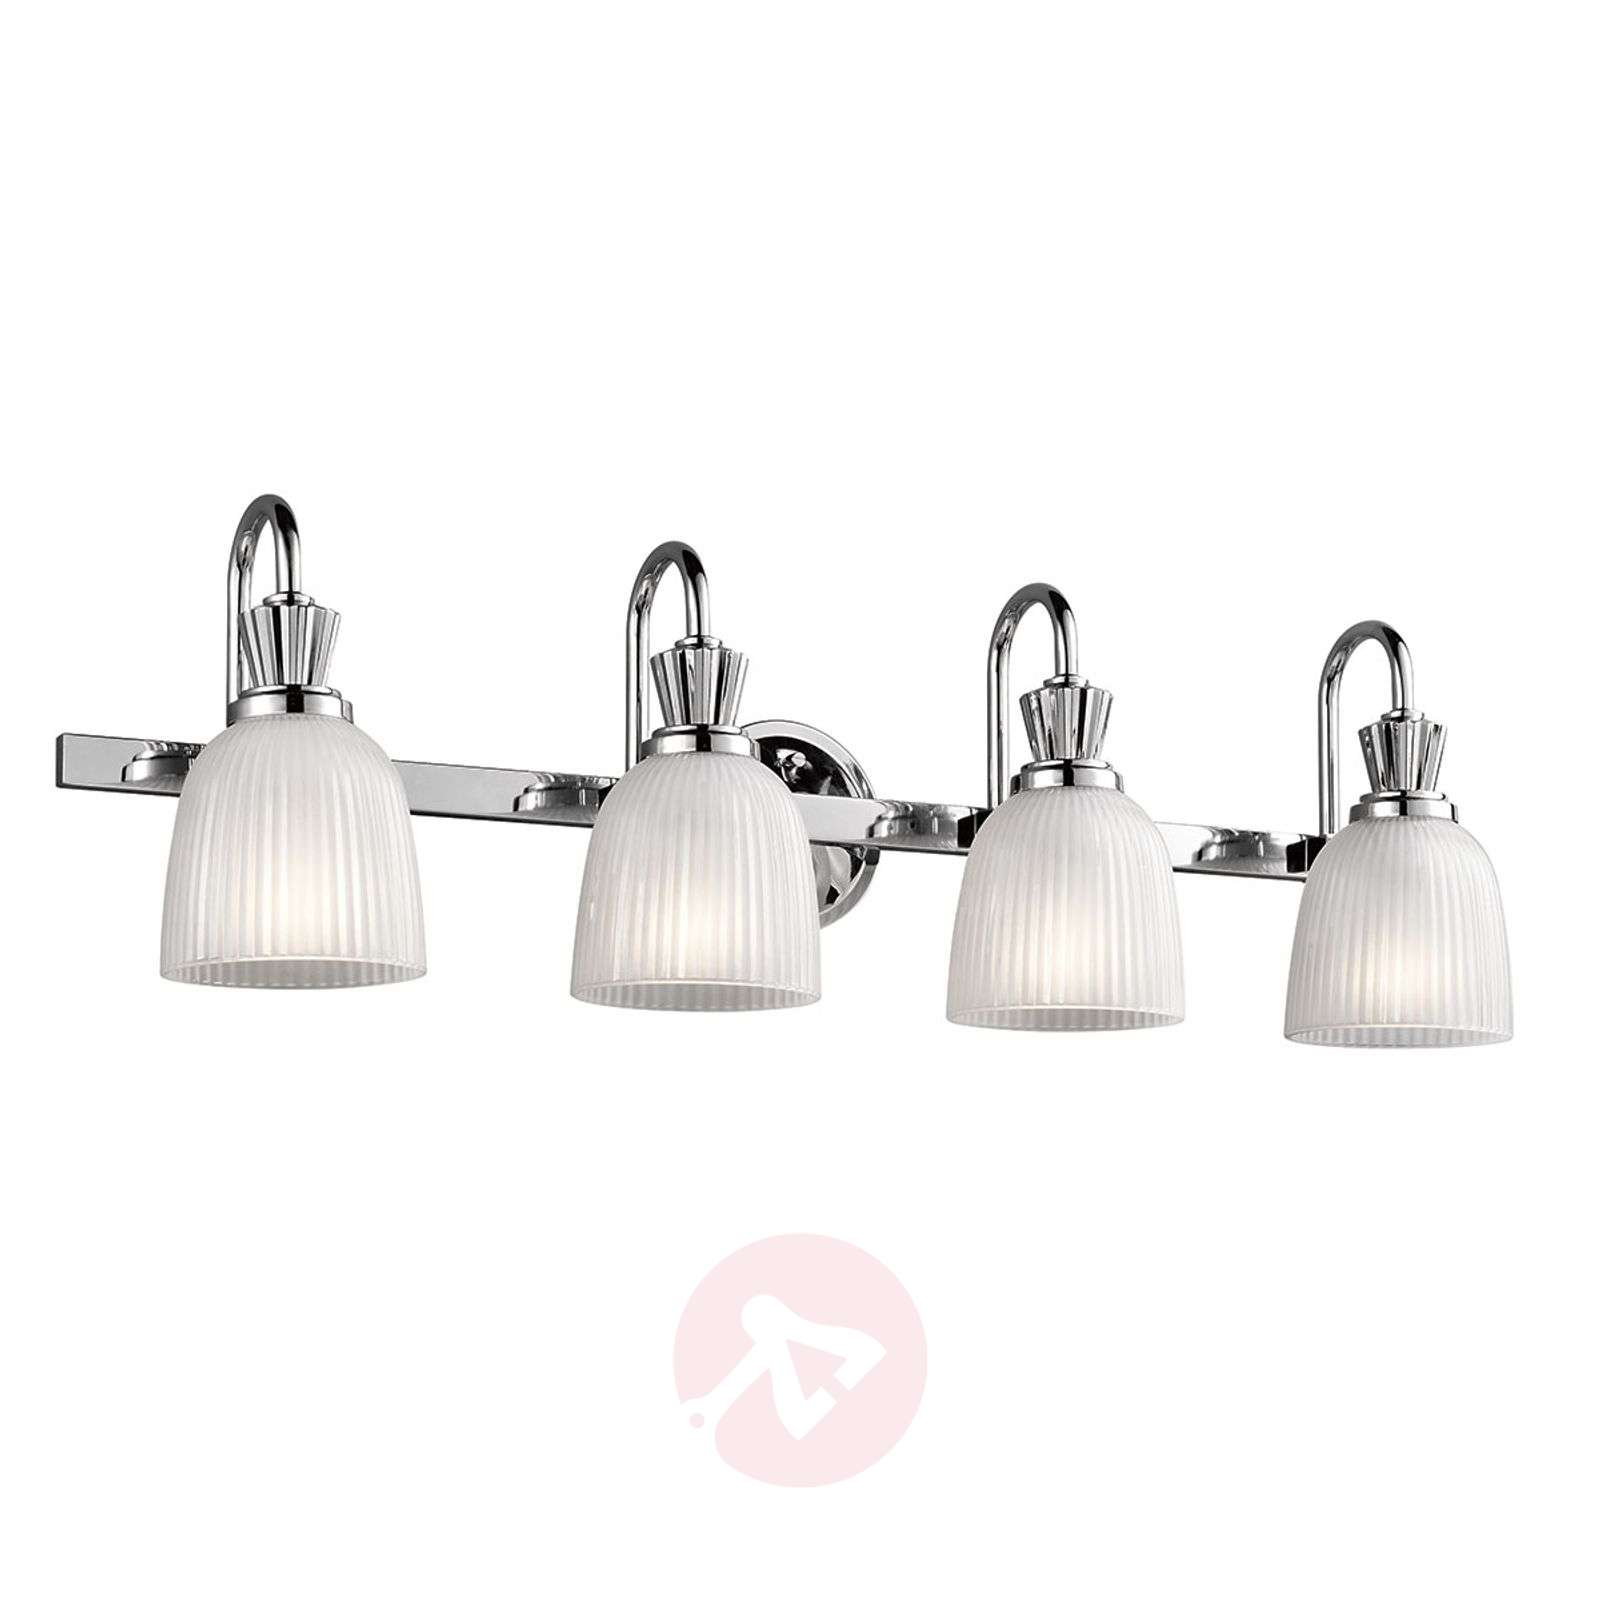 Stylish Led Wall Light Cora Four Bulb